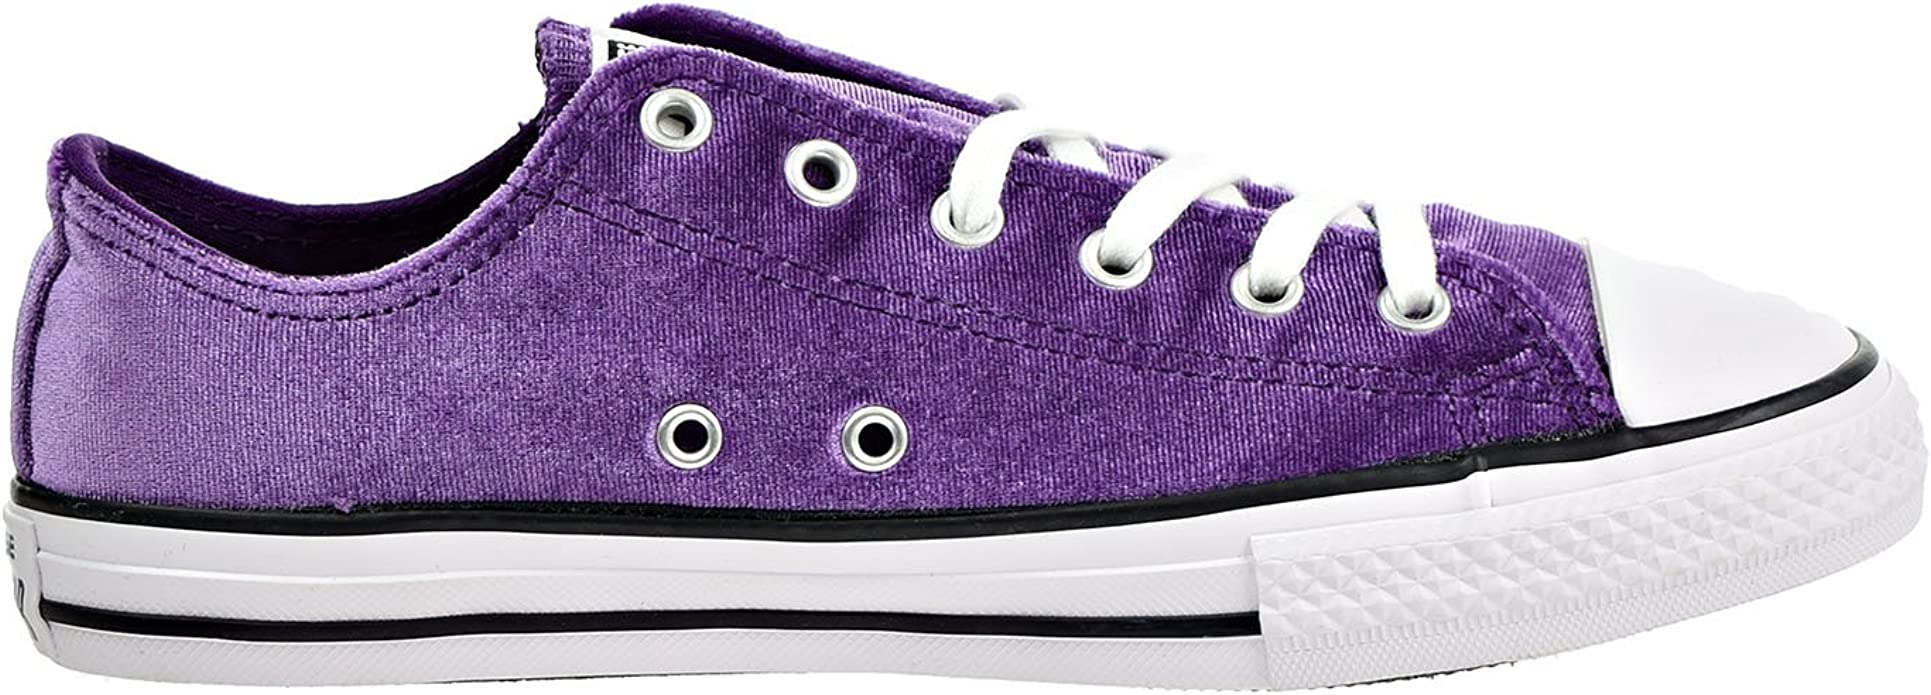 balcón lucha Apretar  Amazon.com | Converse All Star Velvet Ox - Girls Preschool Basketball Shoes  658211F, Night Purple/white/white (1 M US Little Kid) | Sneakers